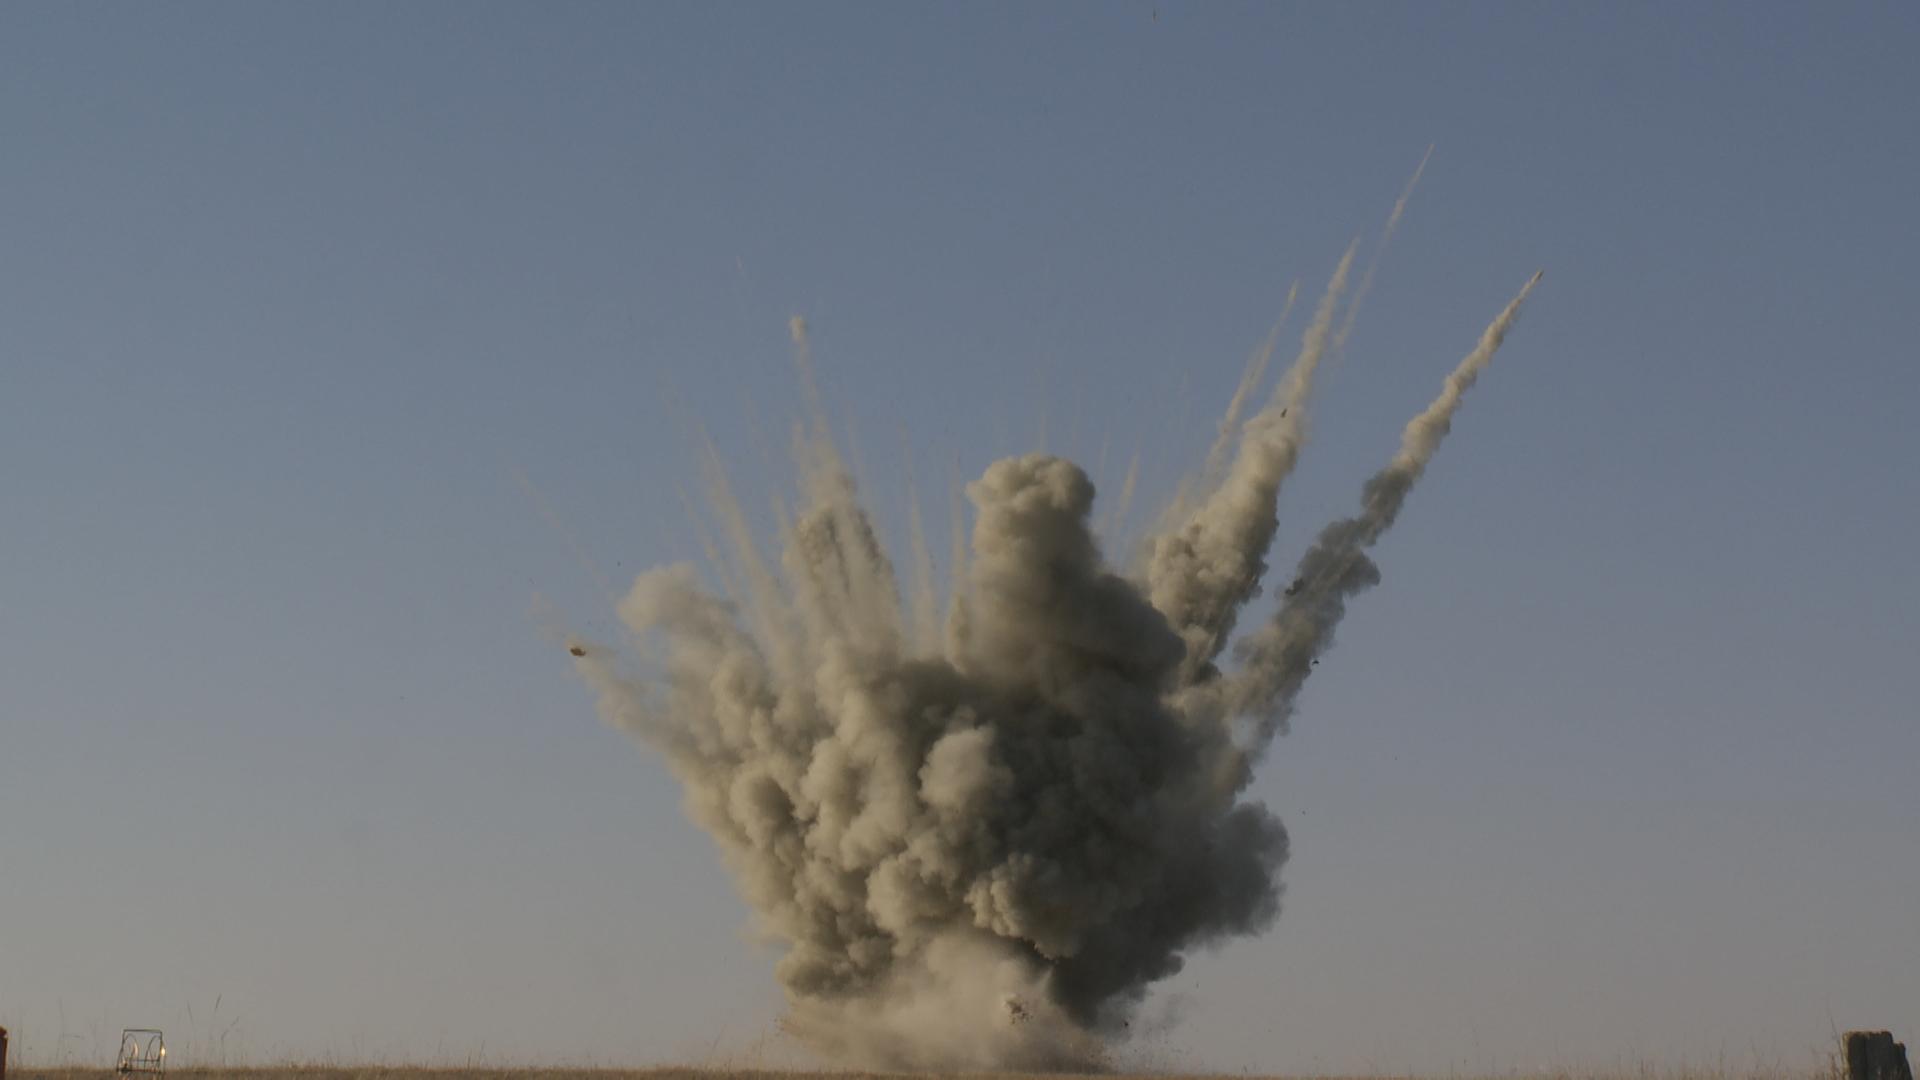 Big Explosion Png Png Image Purepng: Dirt Explosion PNG PNG Image - PurePNG